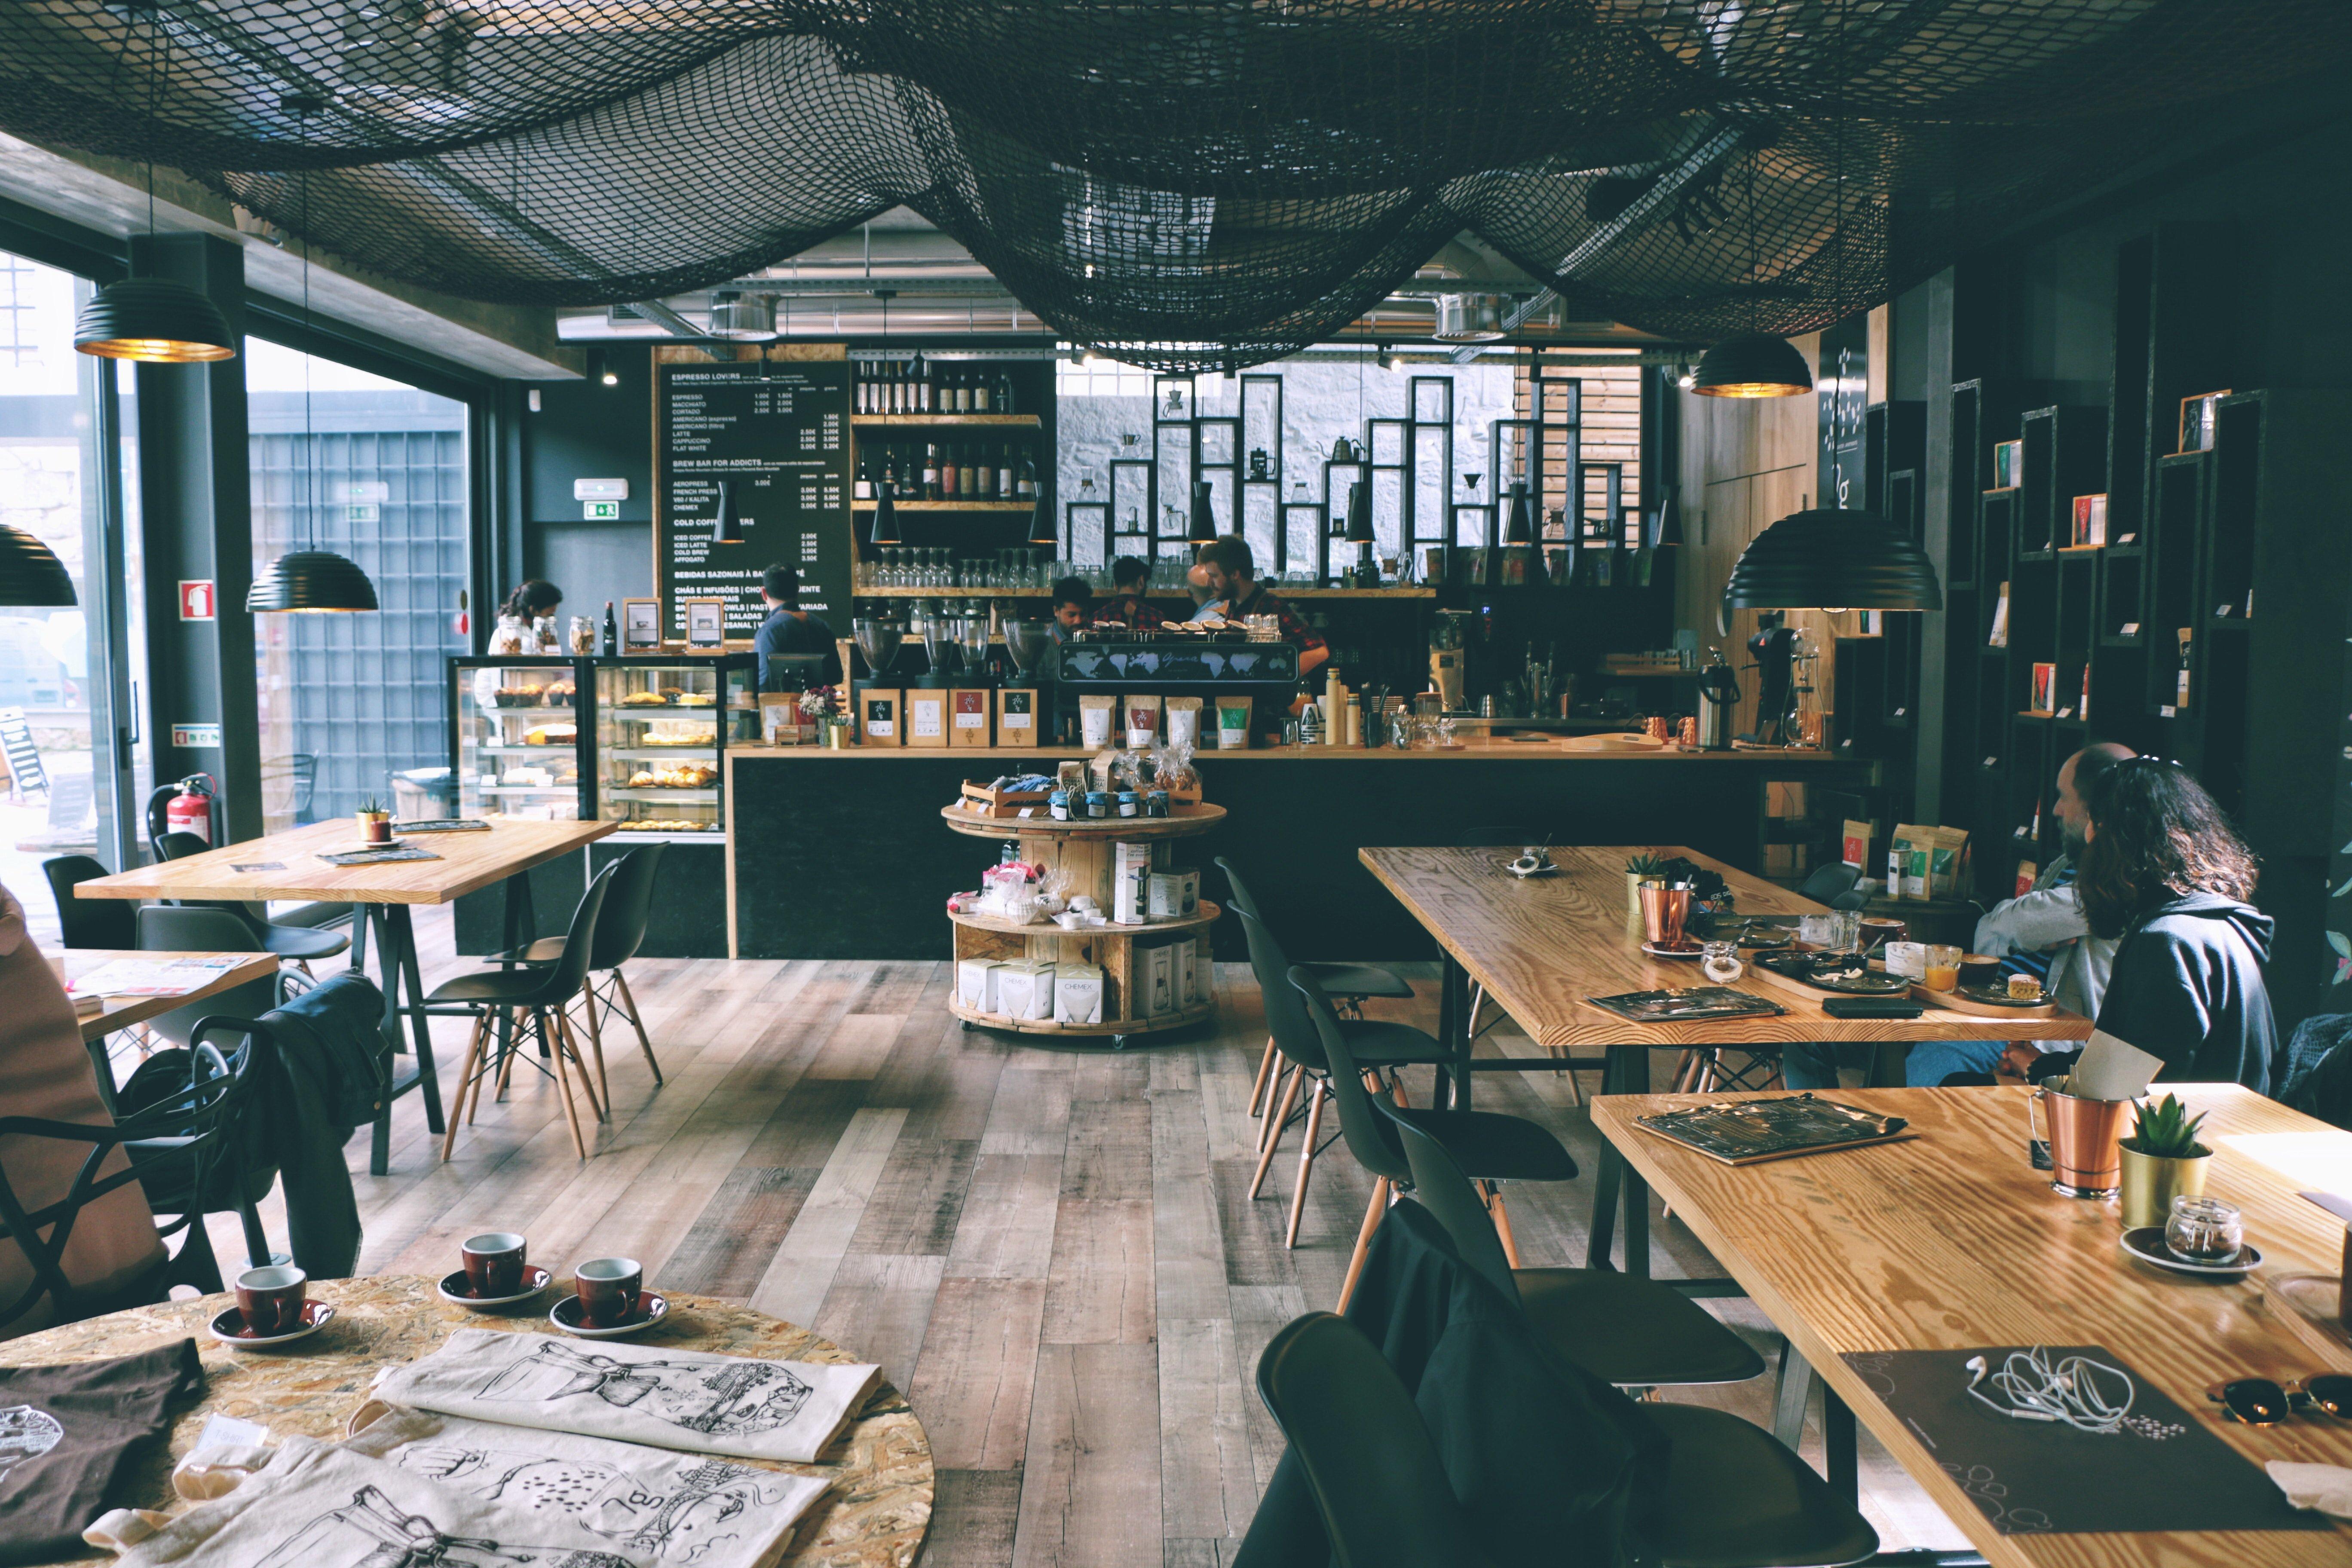 A nice restaurant. | Source: Unsplash